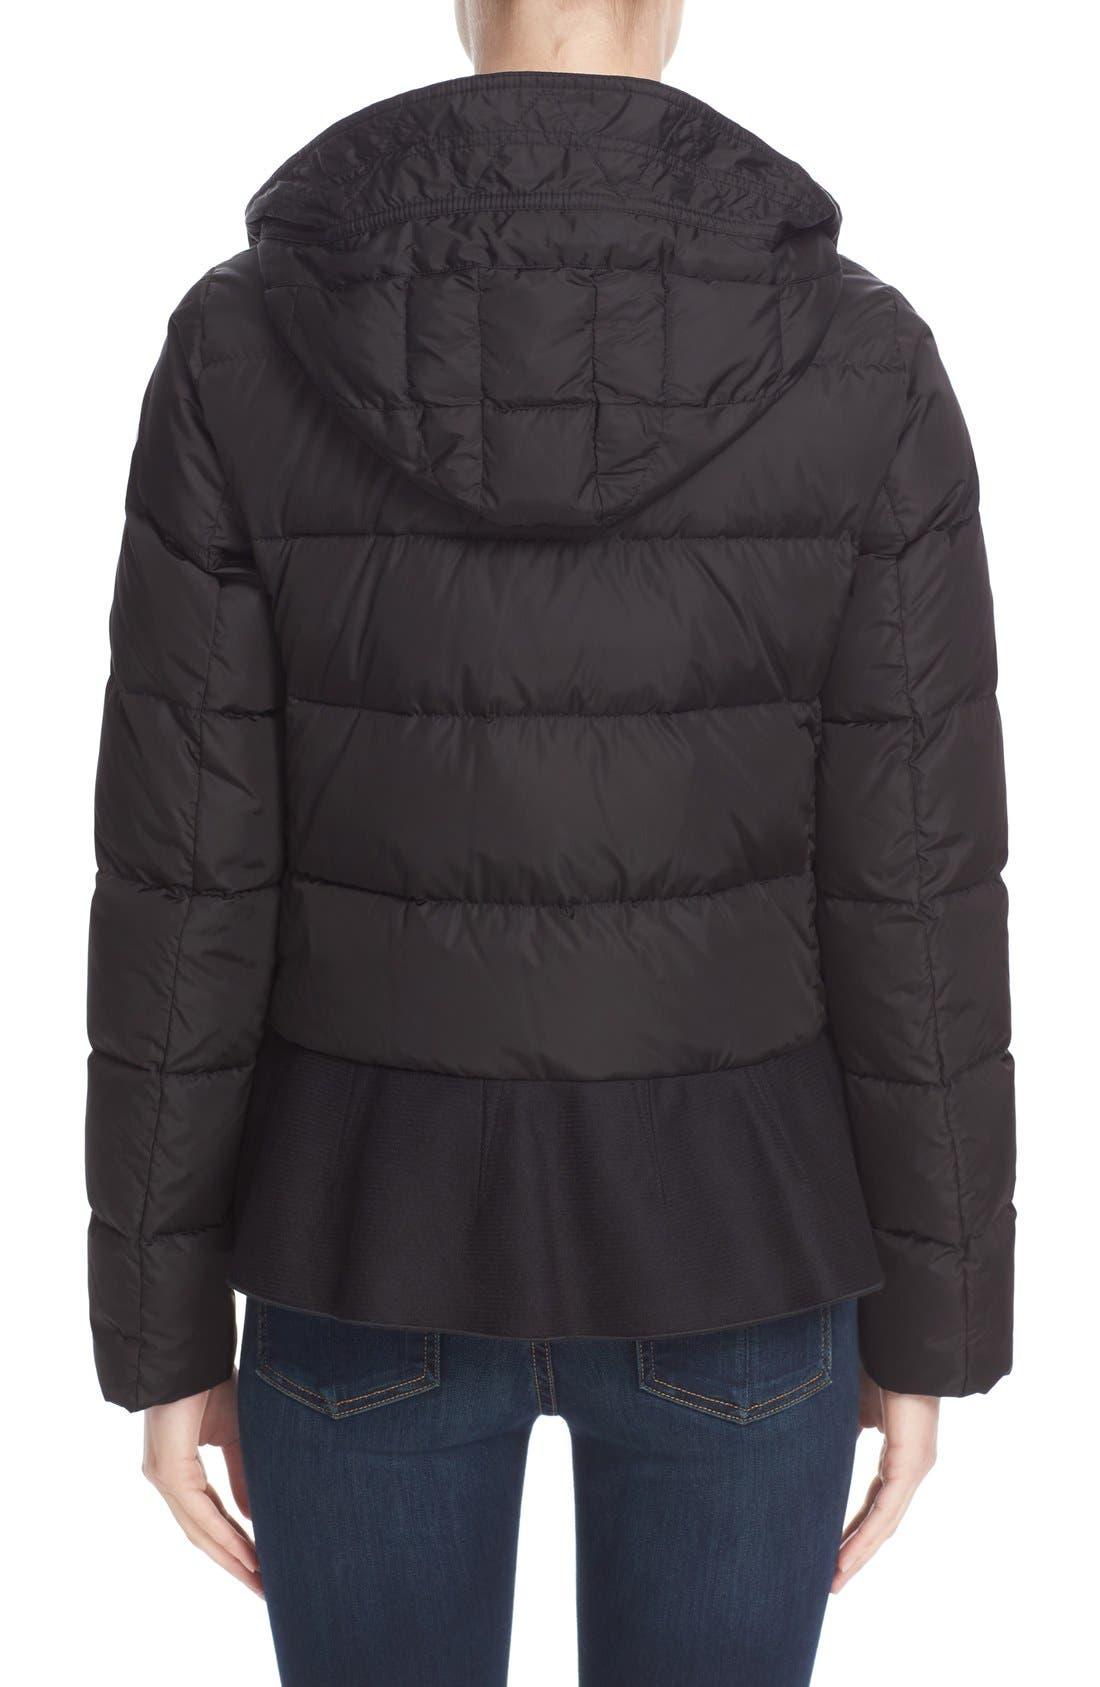 Nesea Peplum Hem Down Puffer Jacket,                             Alternate thumbnail 2, color,                             Black